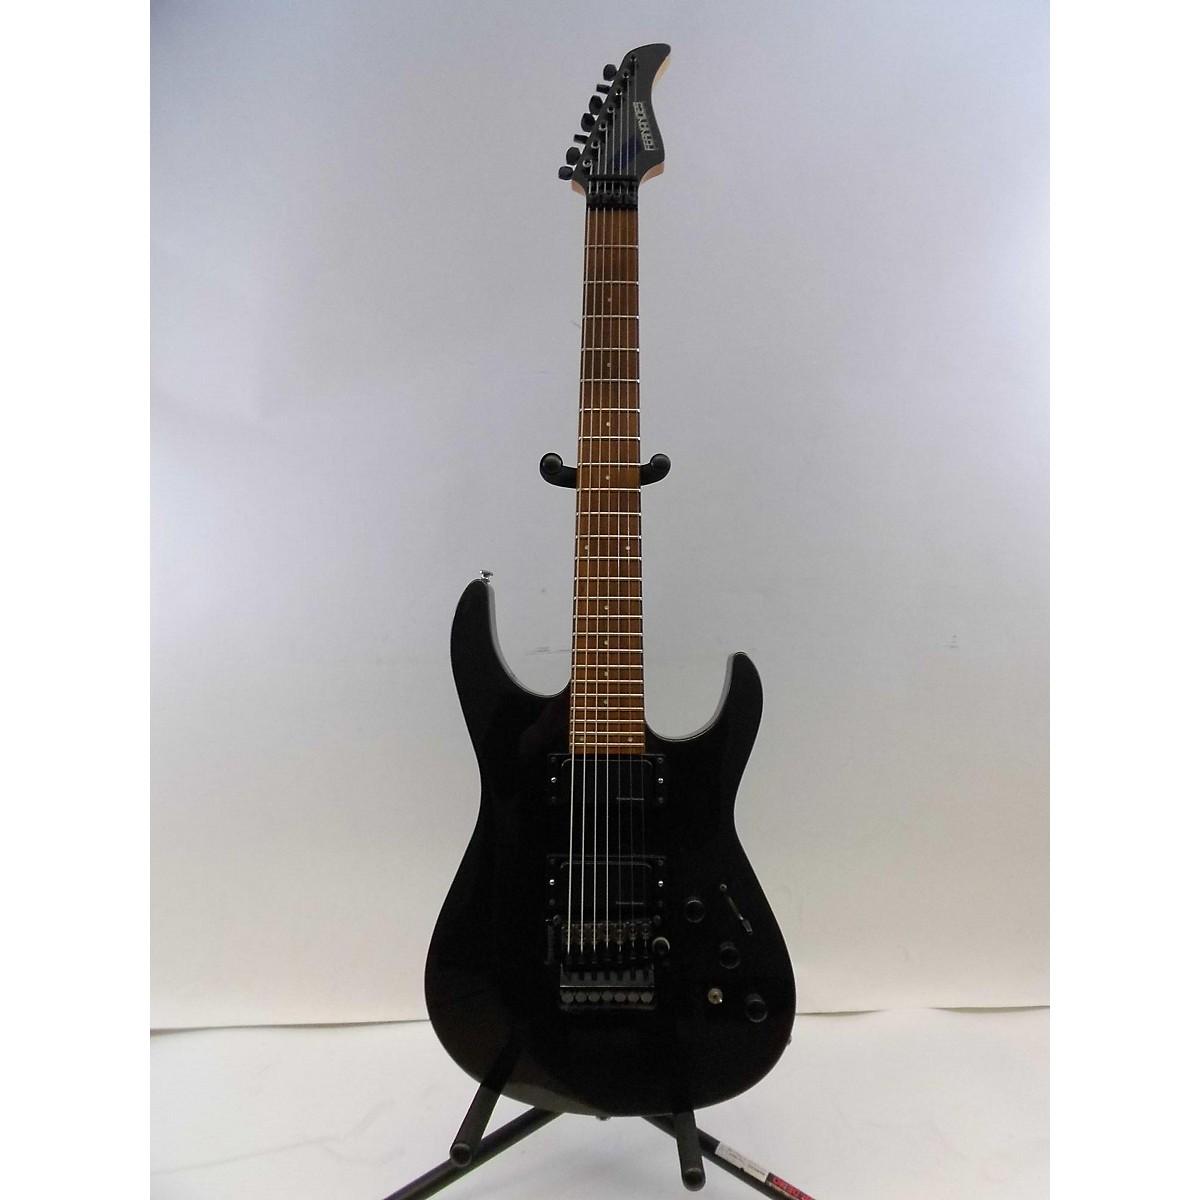 Fernandes Revolver Pro 7 Solid Body Electric Guitar